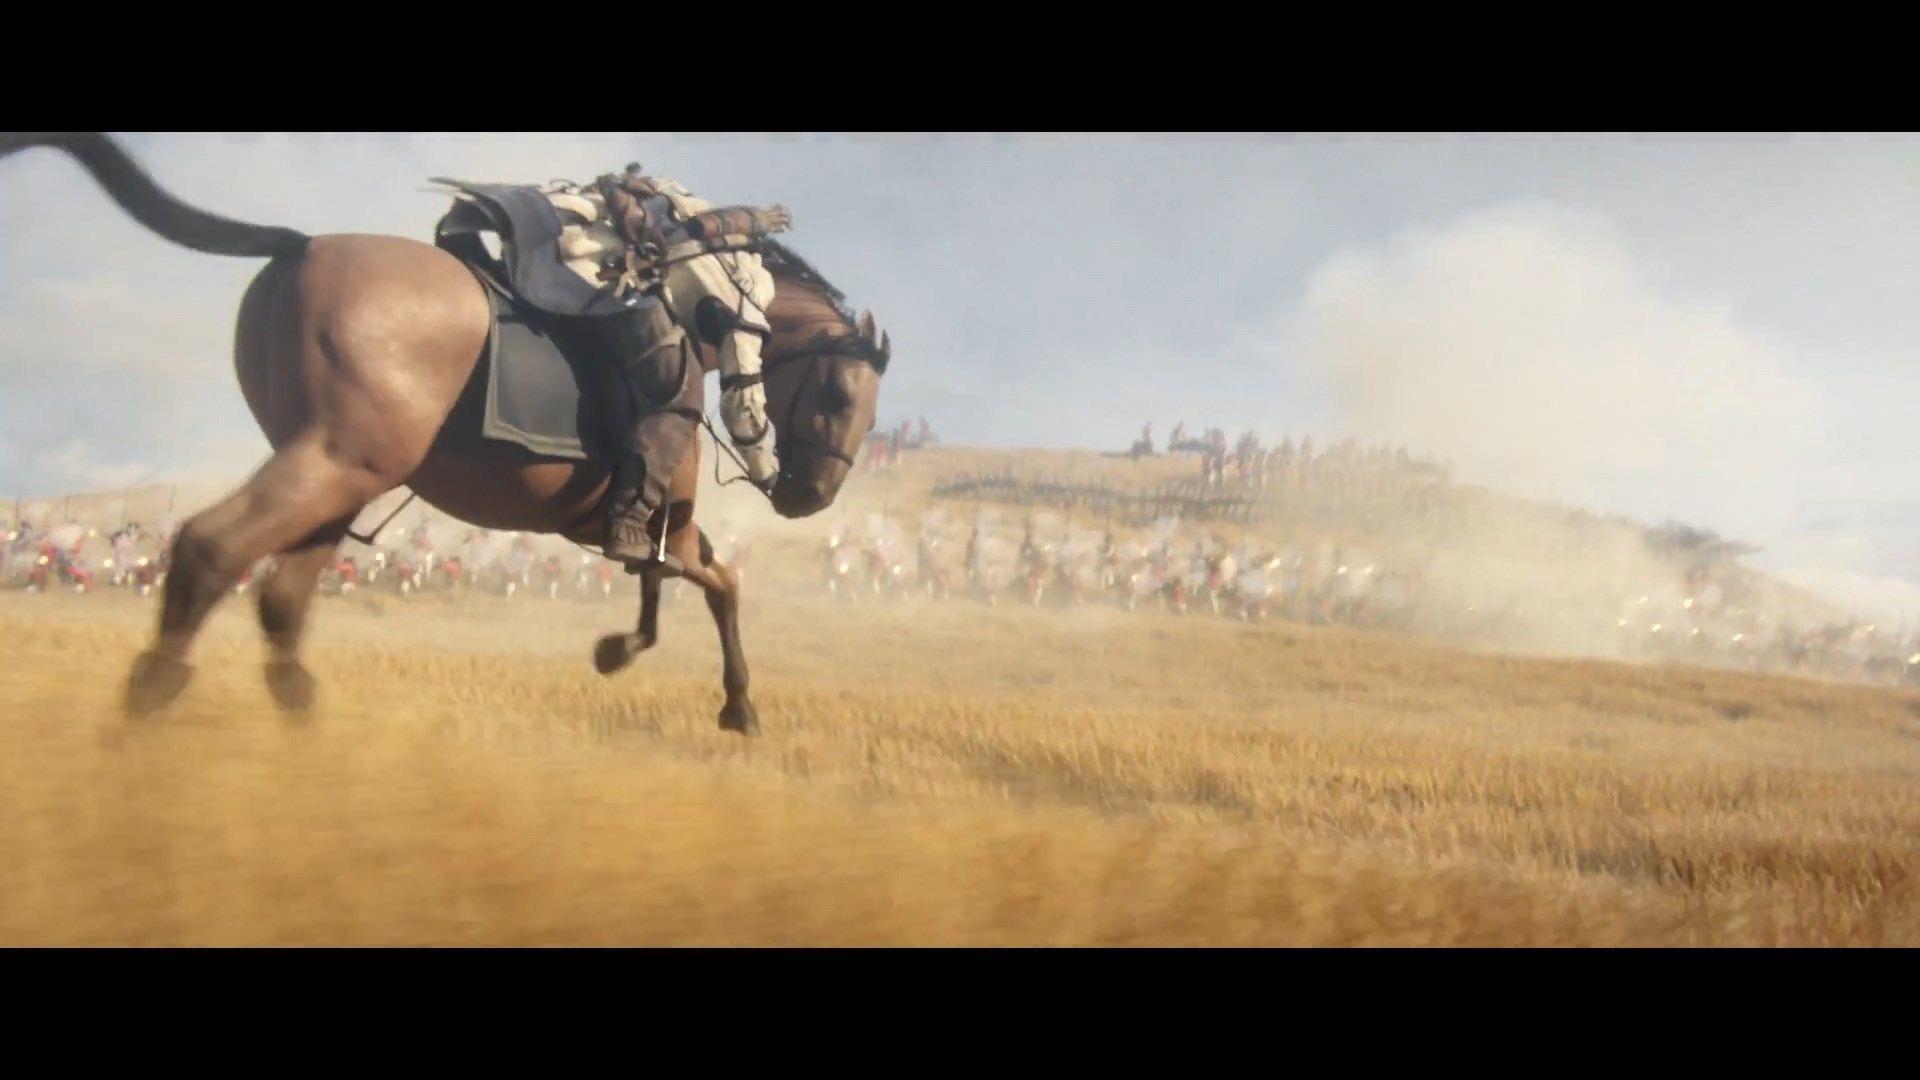 Must see Wallpaper Horse Assassin'S Creed - d89a43733e4da938739a6a2339e8fbb7  Graphic_289864.jpg